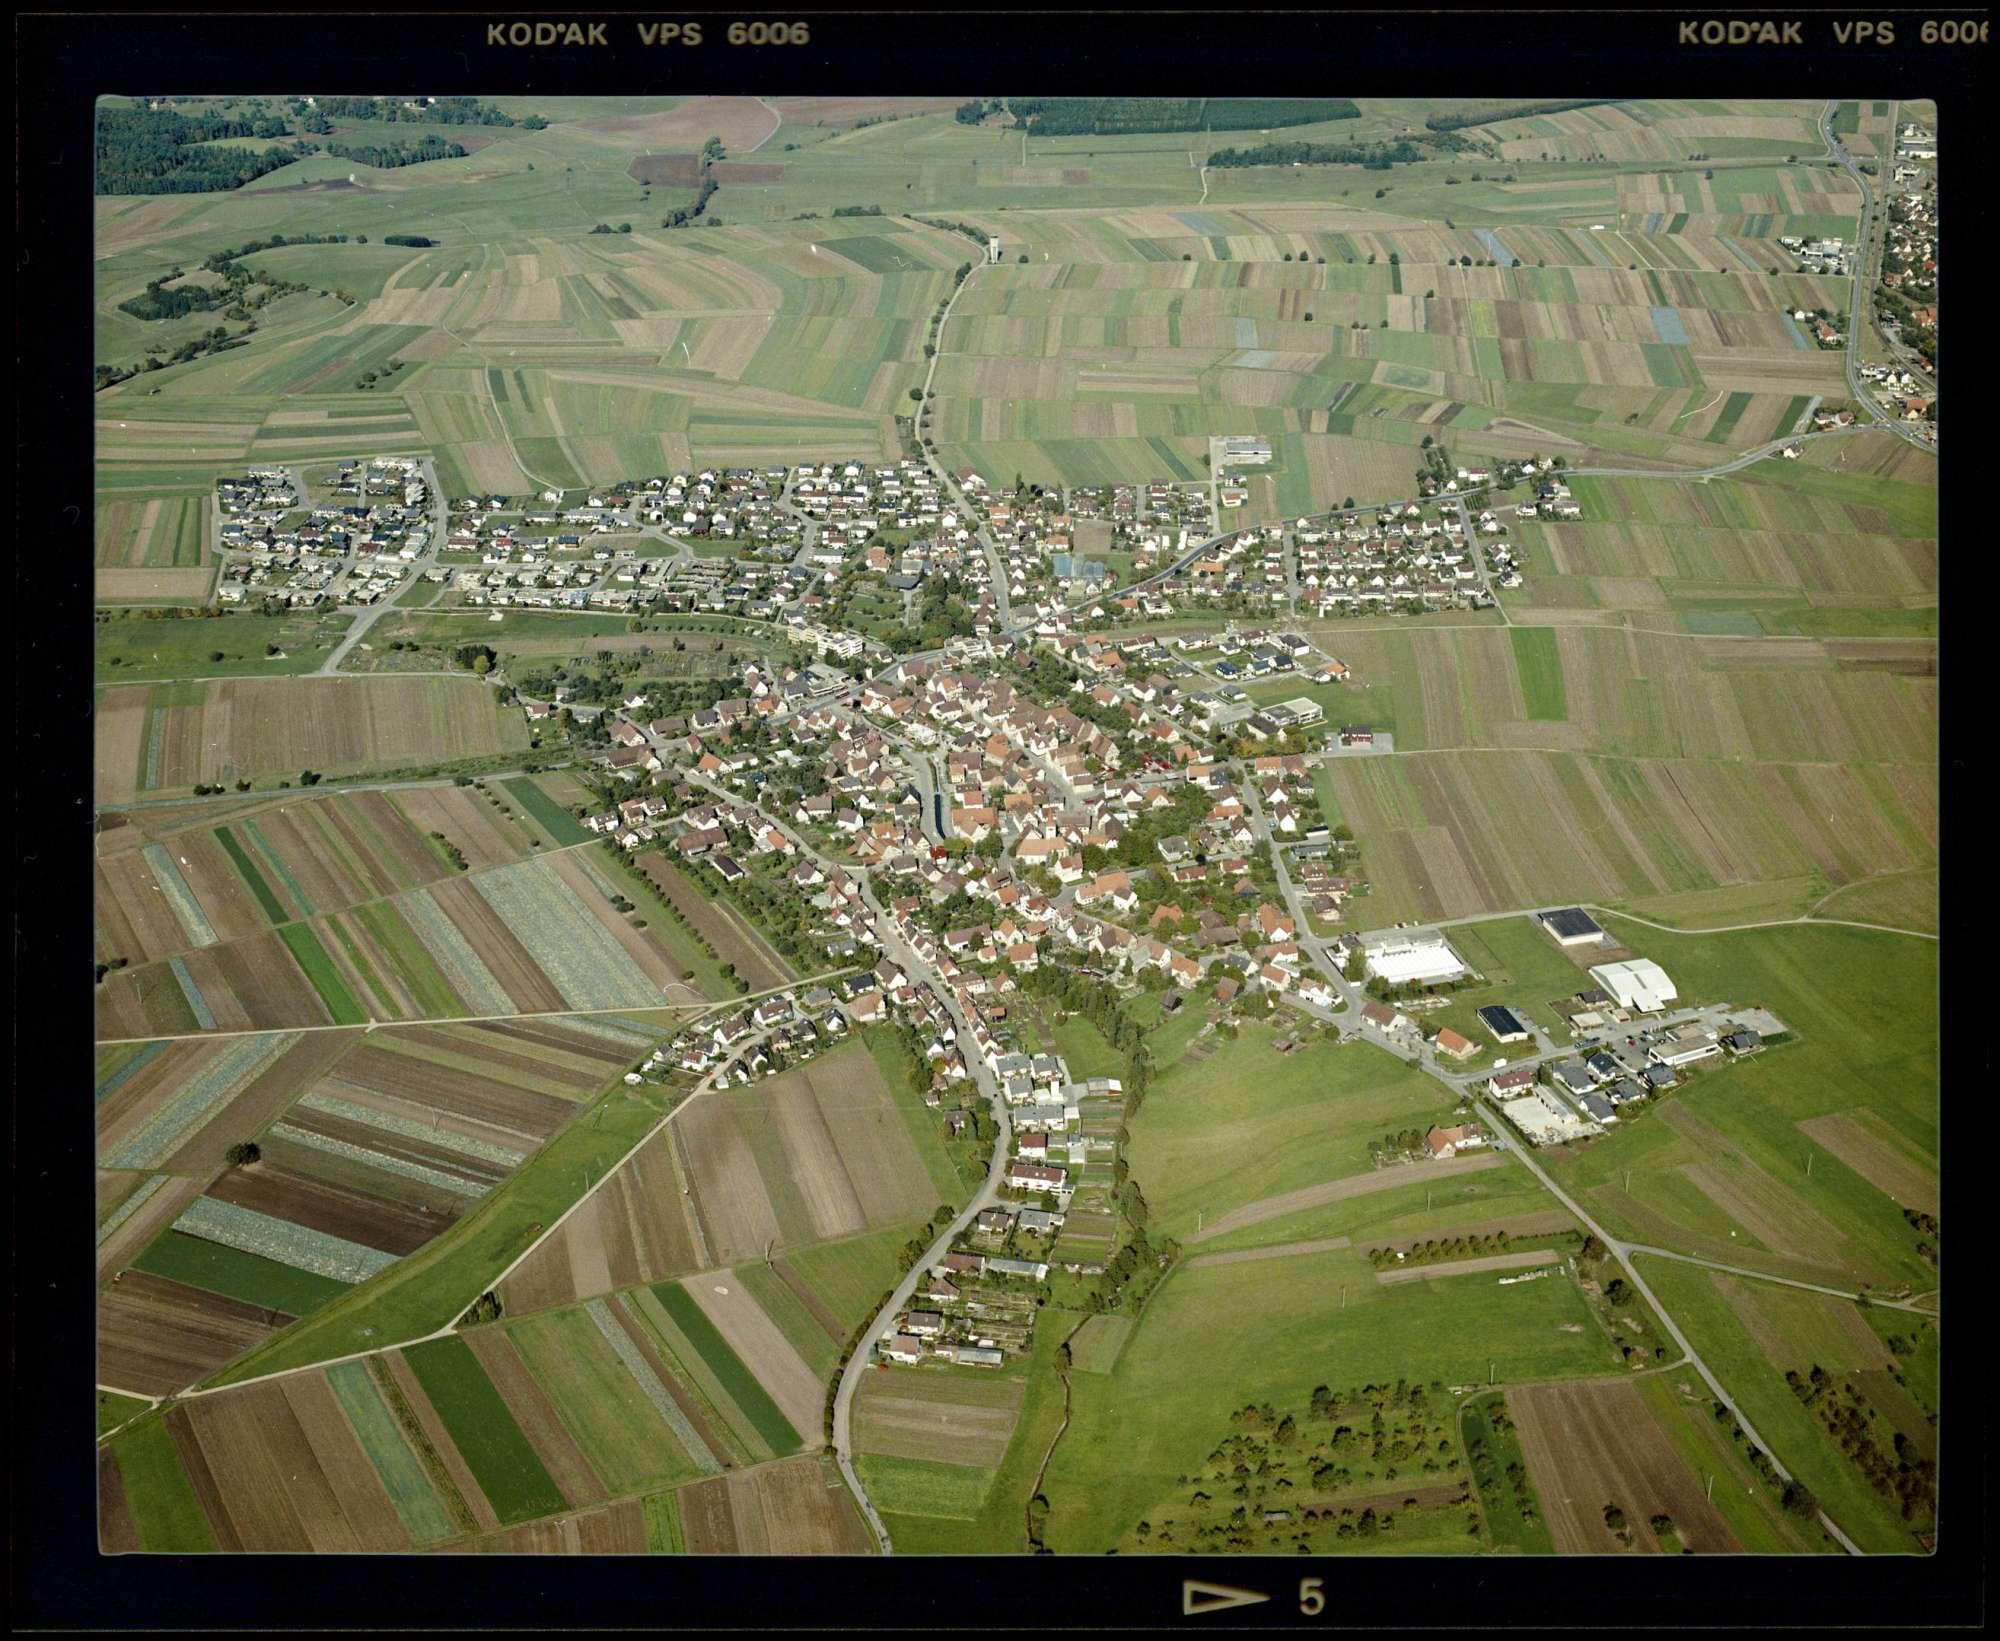 Altdorf, Luftbild, Bild 1